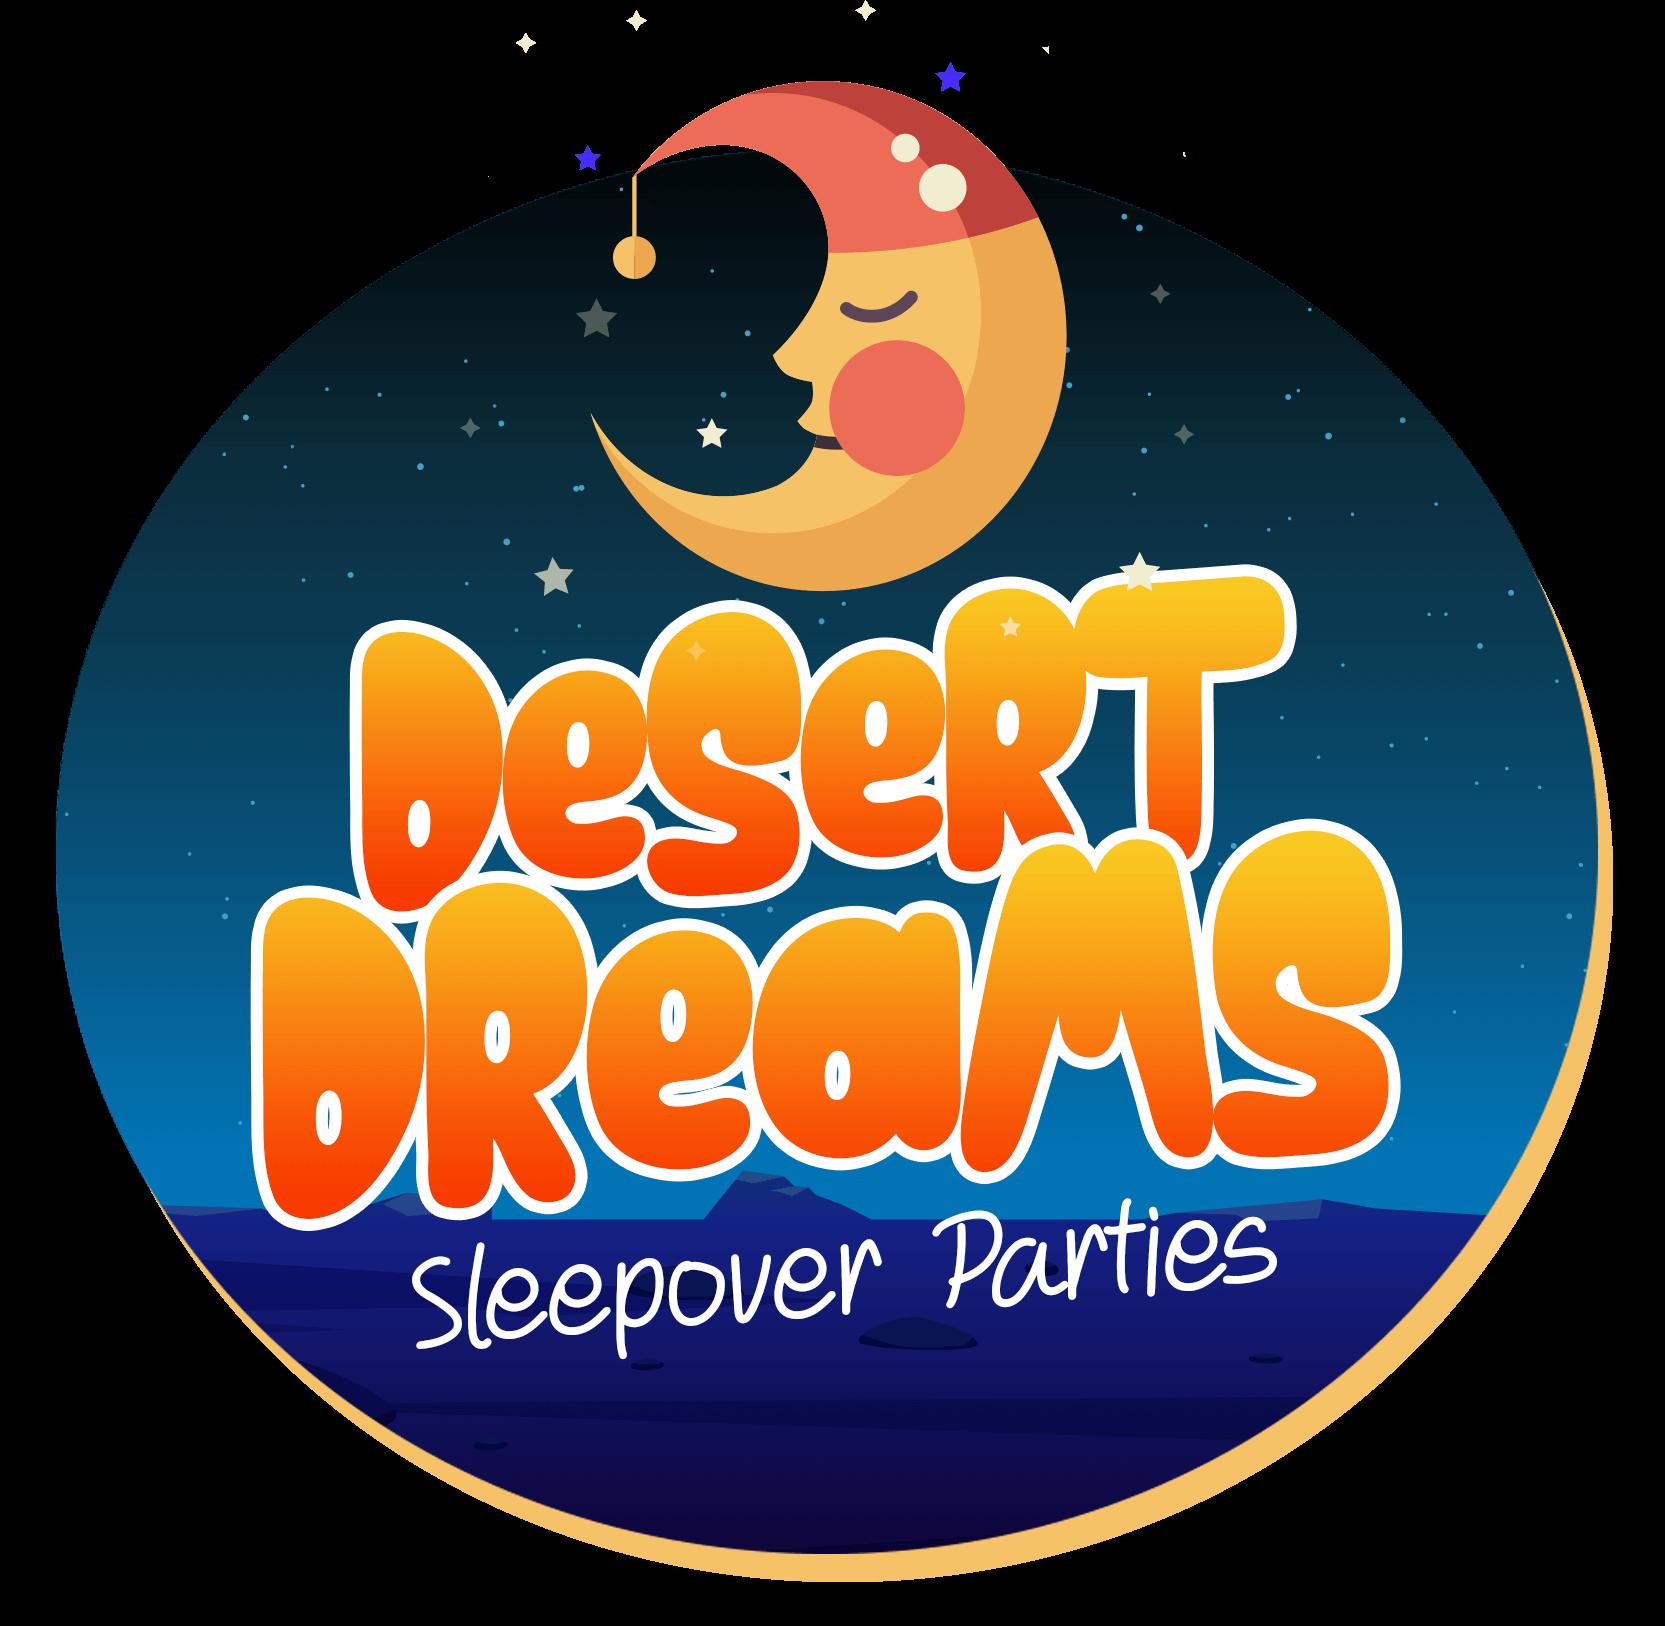 Desert Dreams Sleepover Parties Logo.